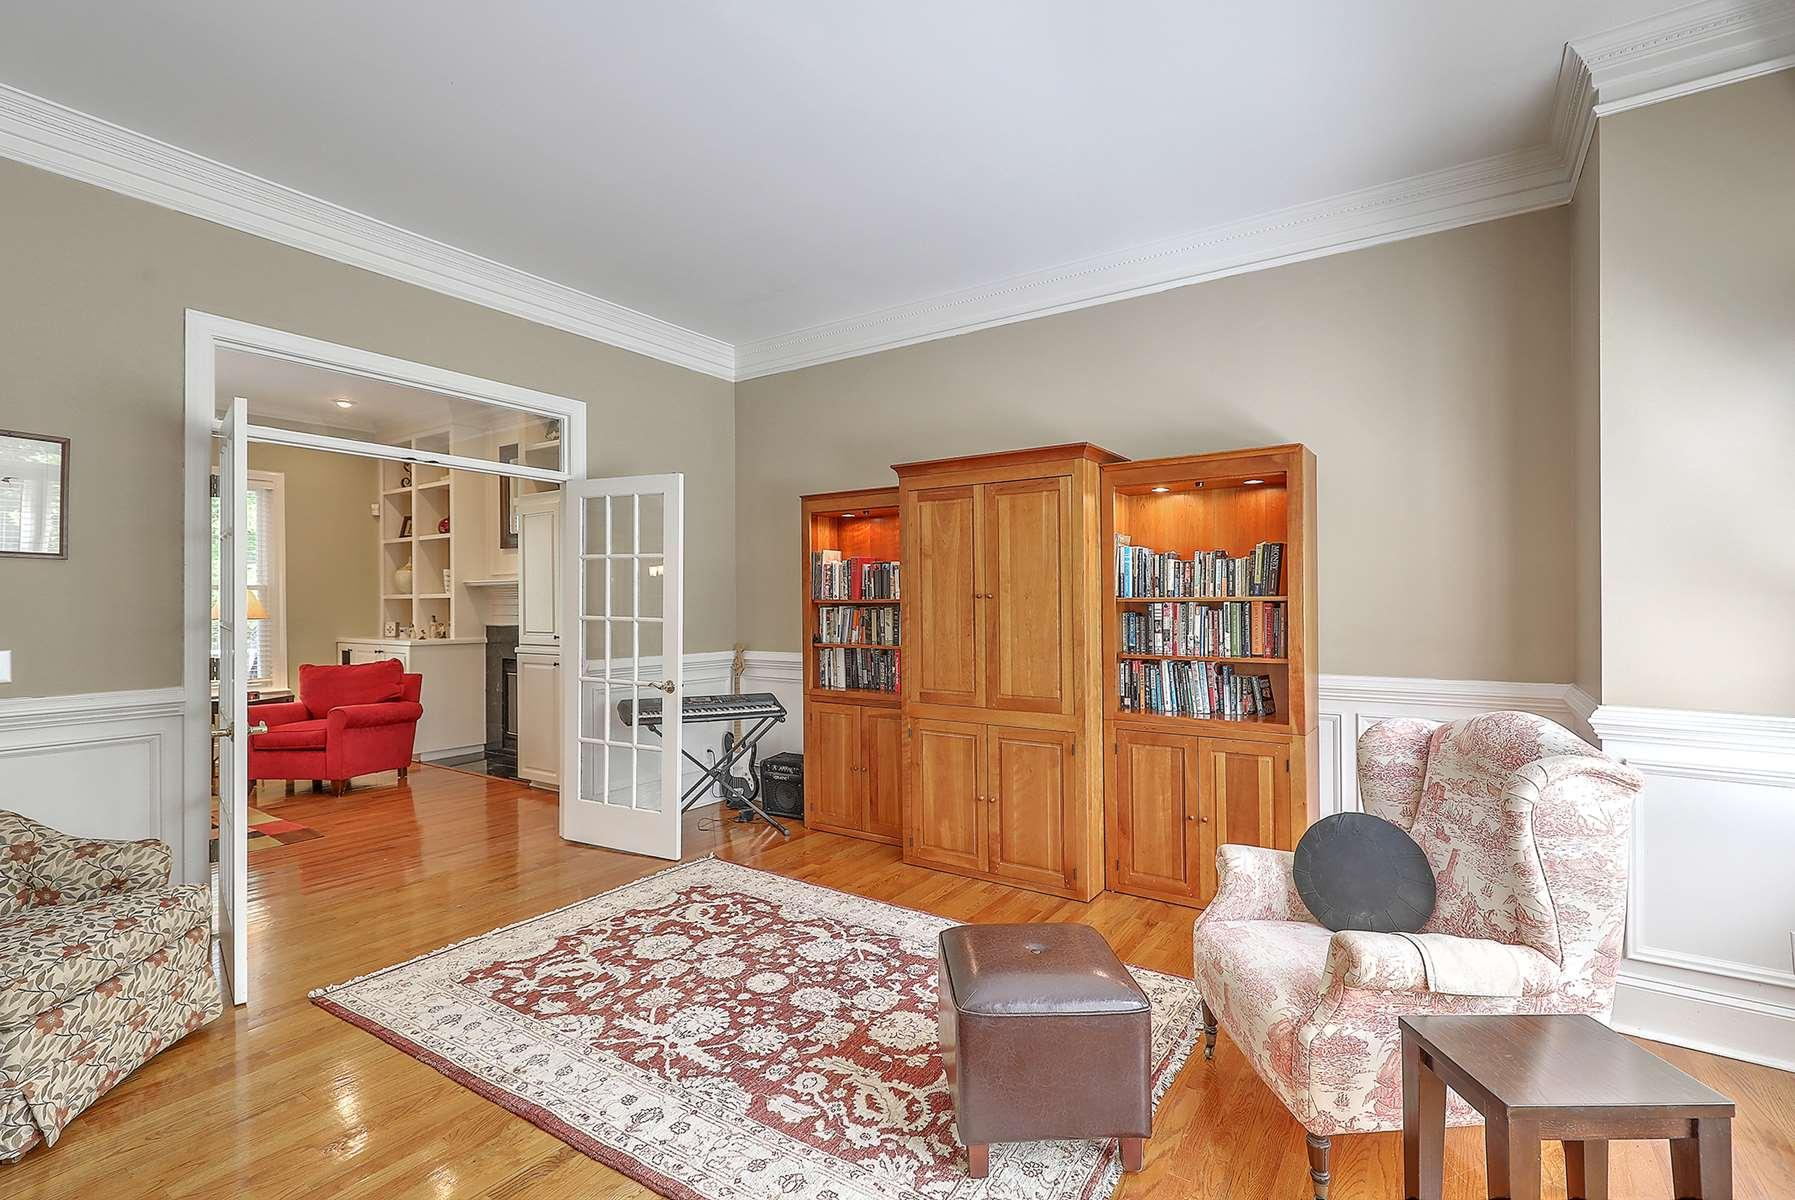 Dunes West Homes For Sale - 2961 Pignatelli, Mount Pleasant, SC - 34